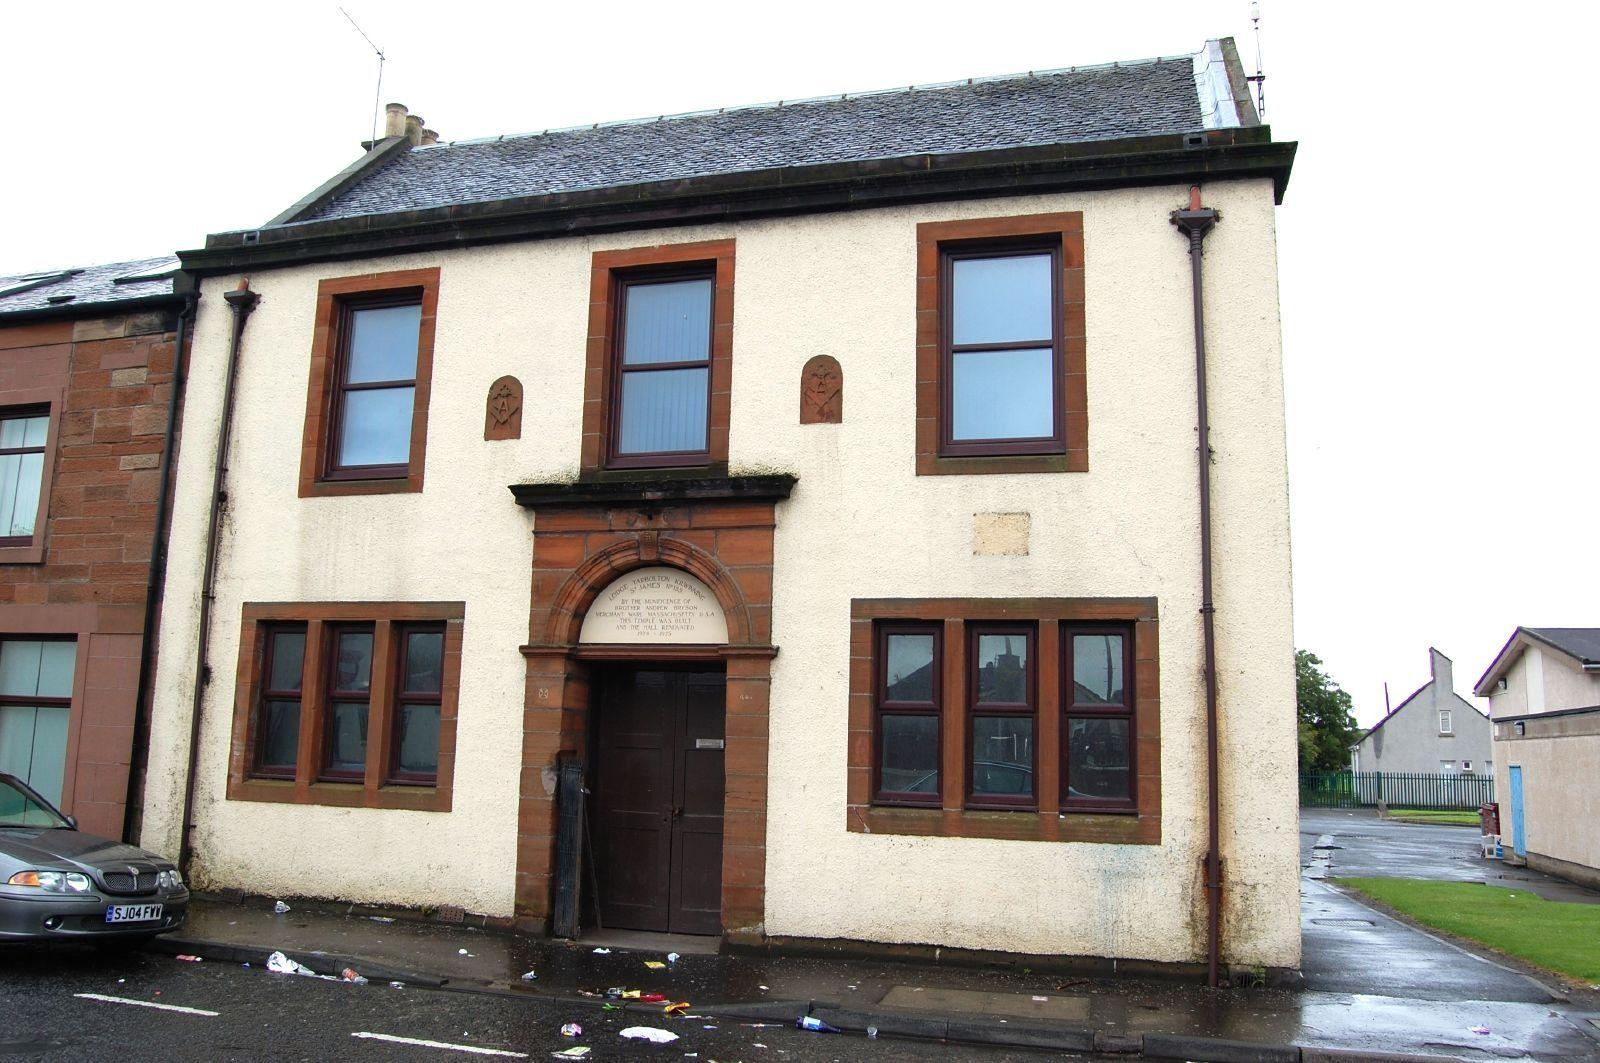 Lodge Tarbolton Kilwinning St James No 135 Tarbolton Ayrshire